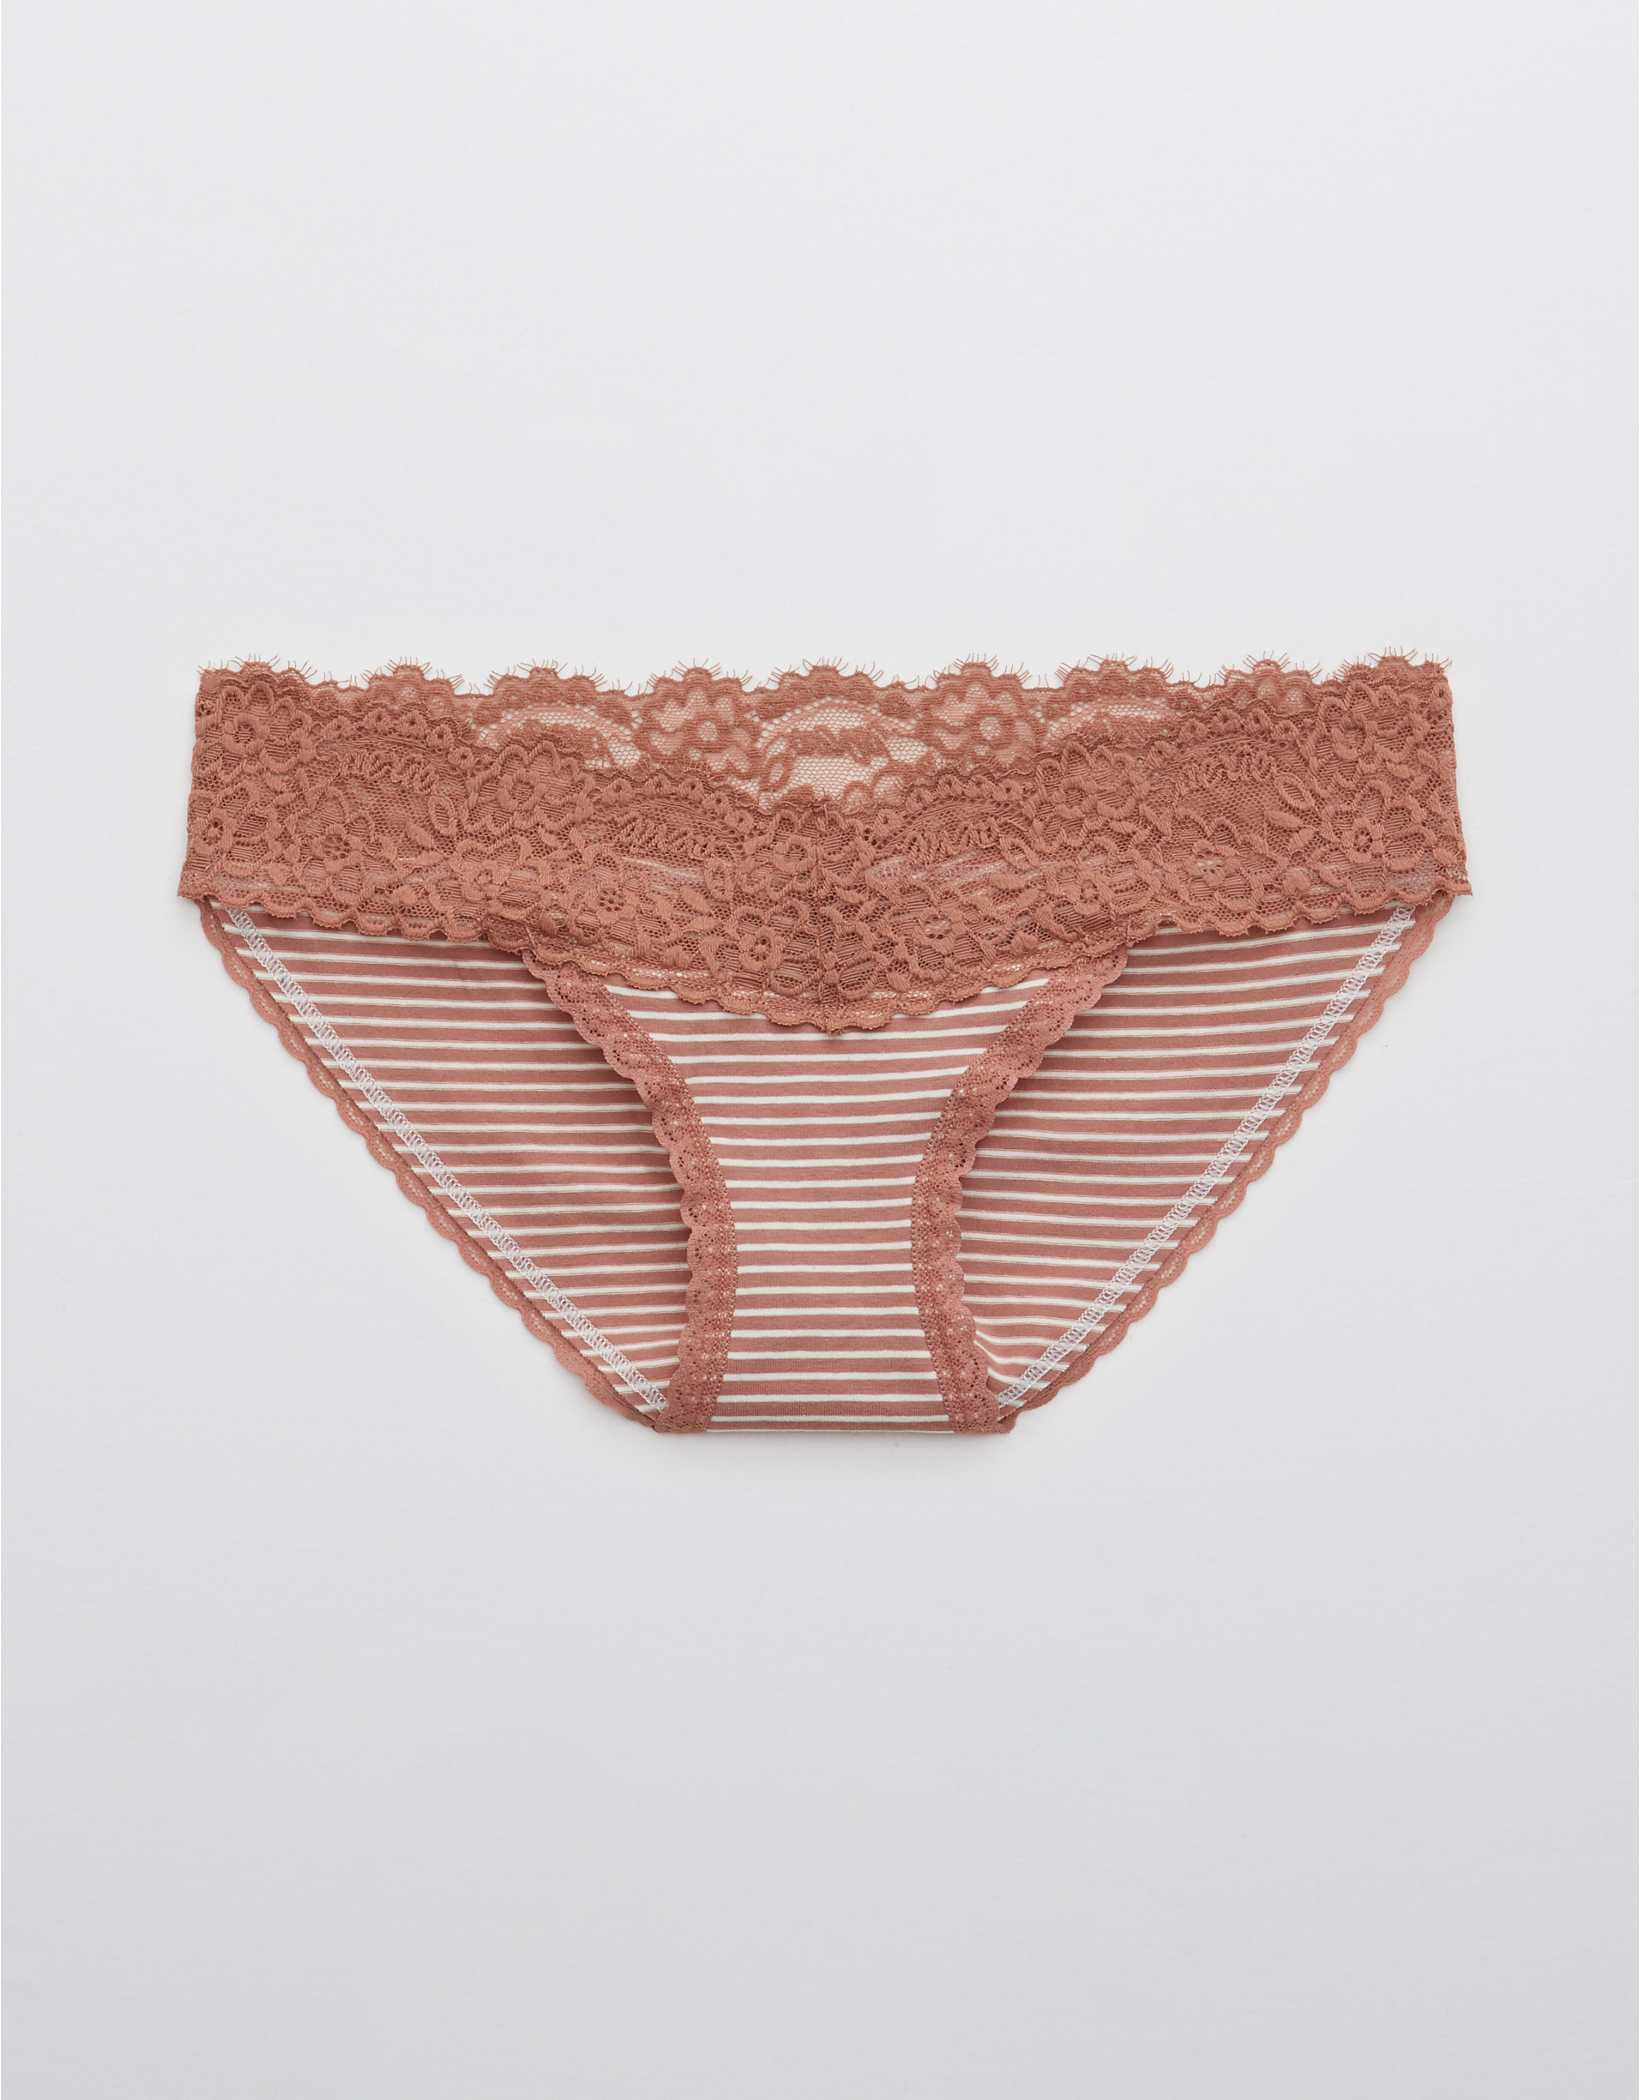 Aerie Cotton Eyelash Lace Printed Bikini Underwear